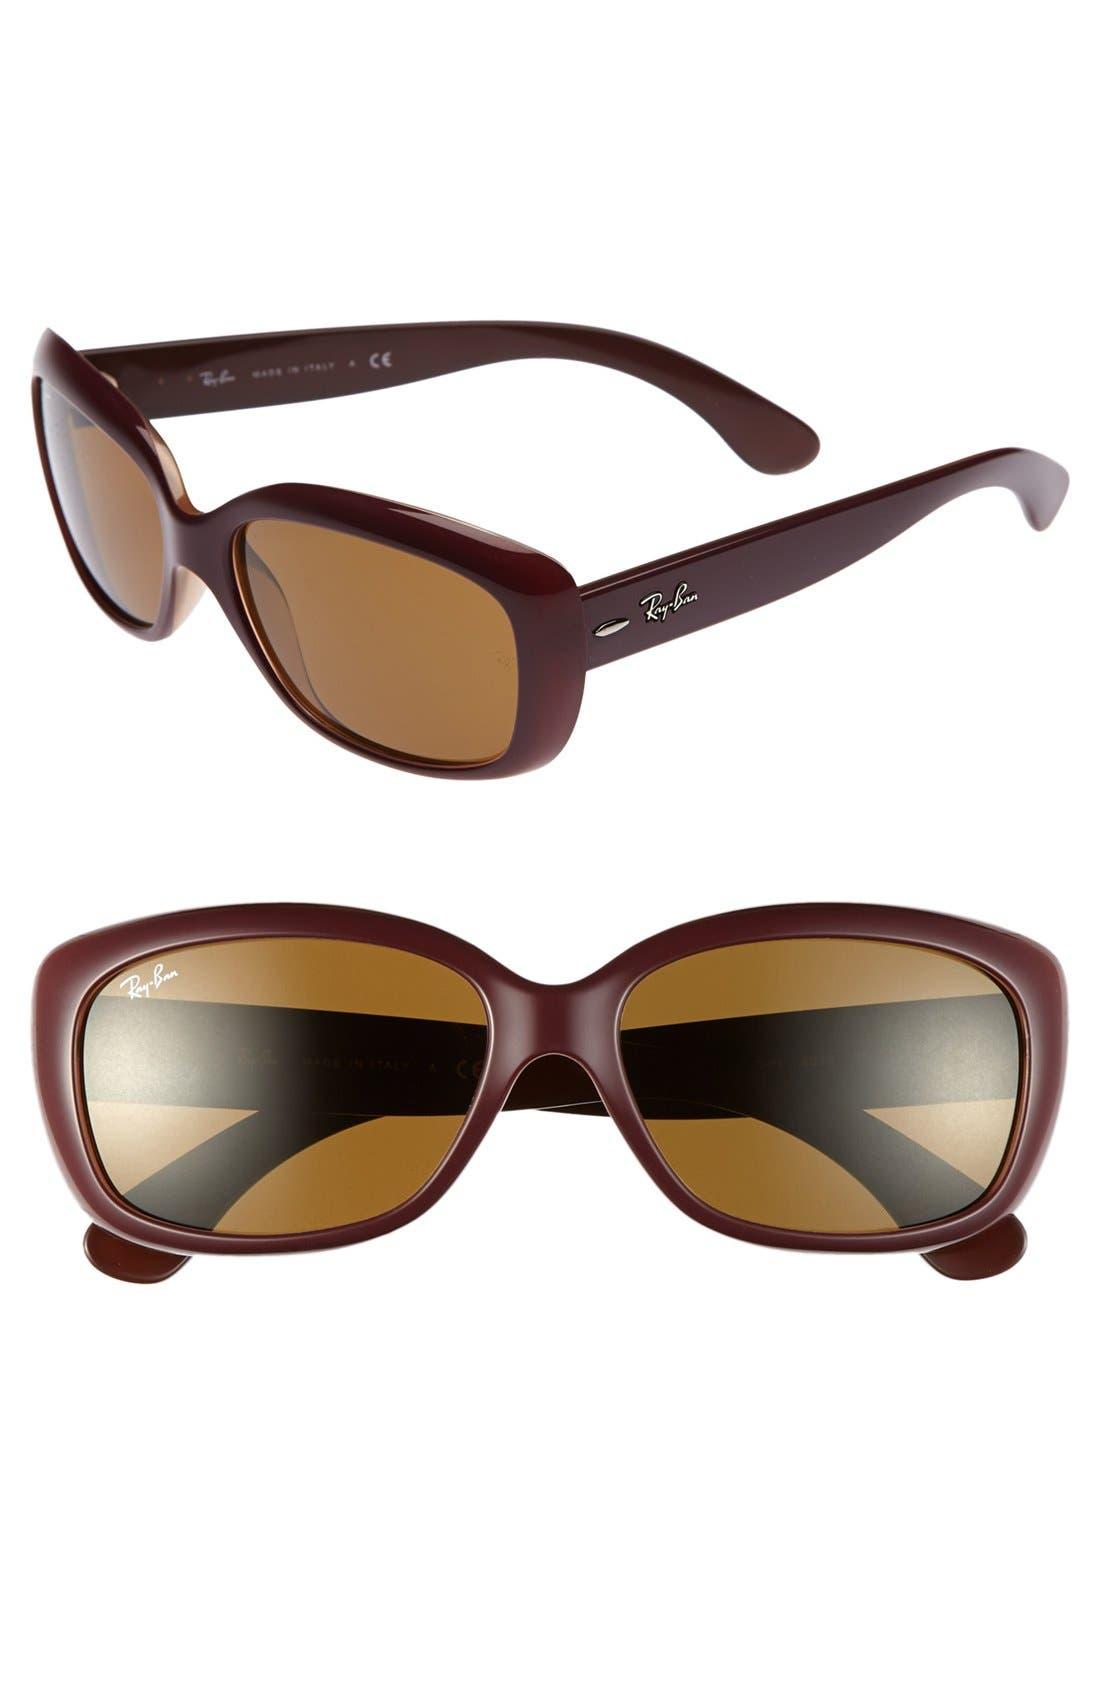 Alternate Image 1 Selected - Ray-Ban 'Pilot' 58mm Sunglasses